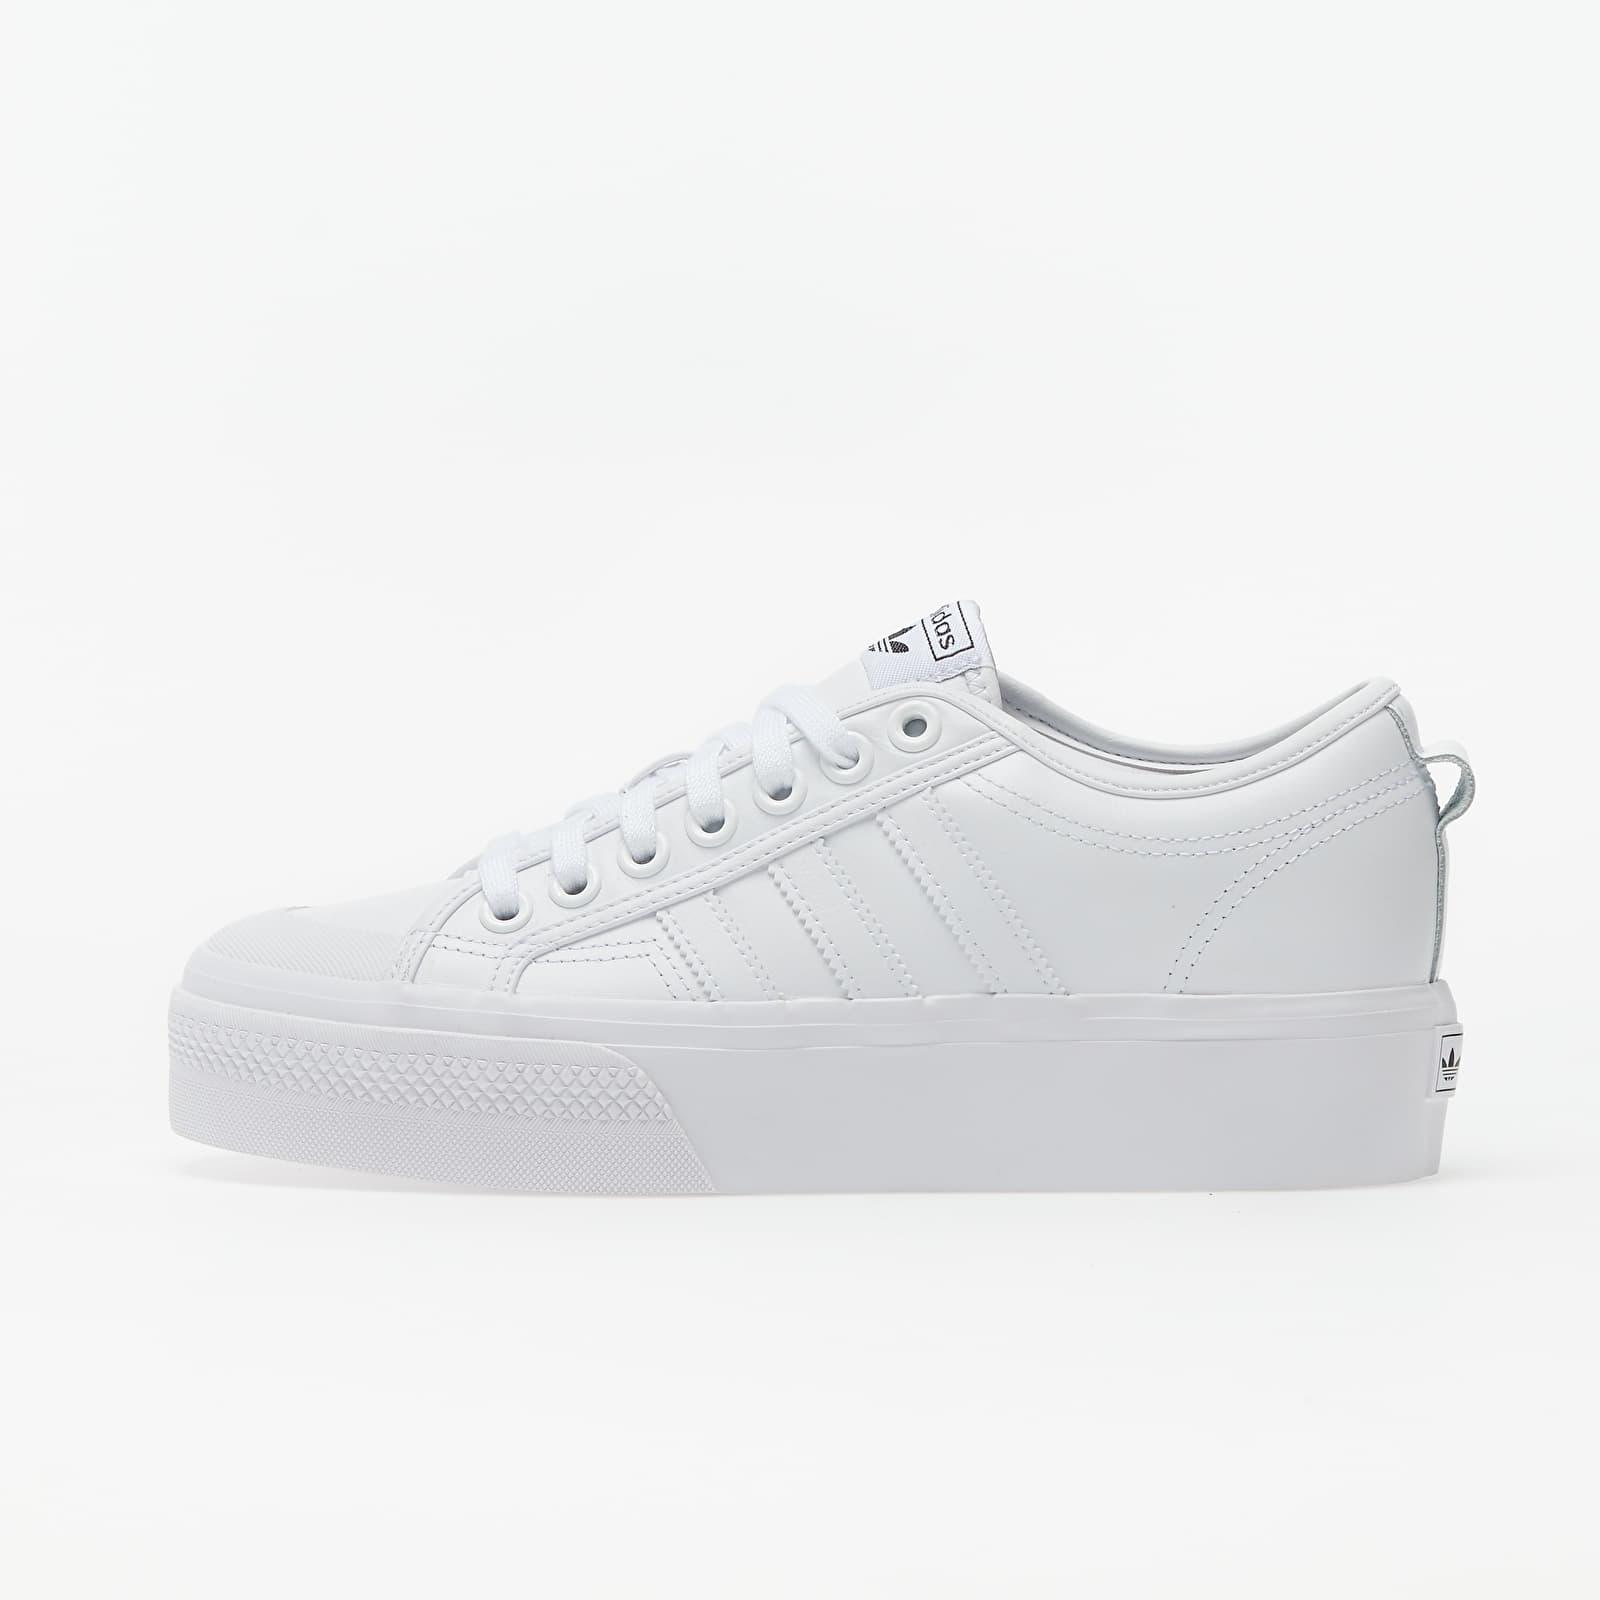 Dámske topánky a tenisky adidas Nizza Platform W Ftw White/ Ftw White/ Core Black